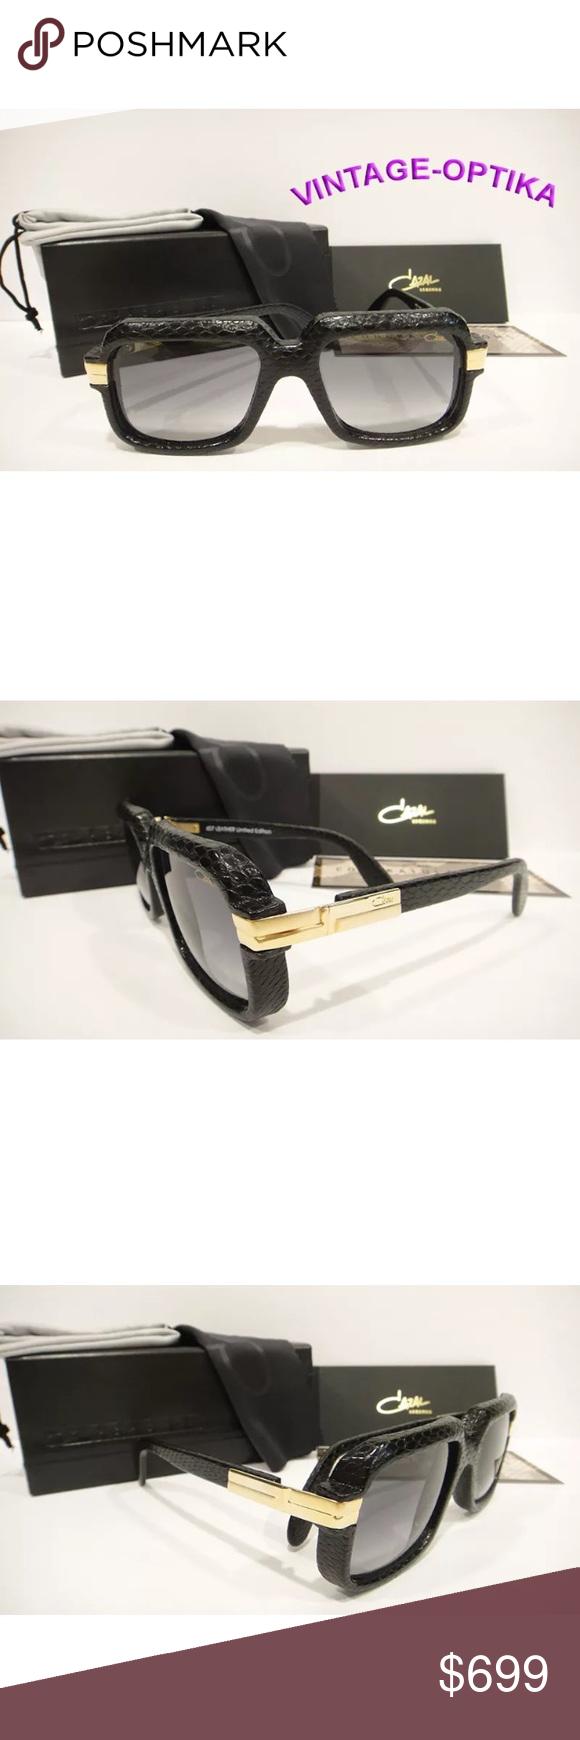 a1c66fff23f6 CAZAL 607 3 Sunglasses SNAKESKIN Black New These are 100% Genuine ...